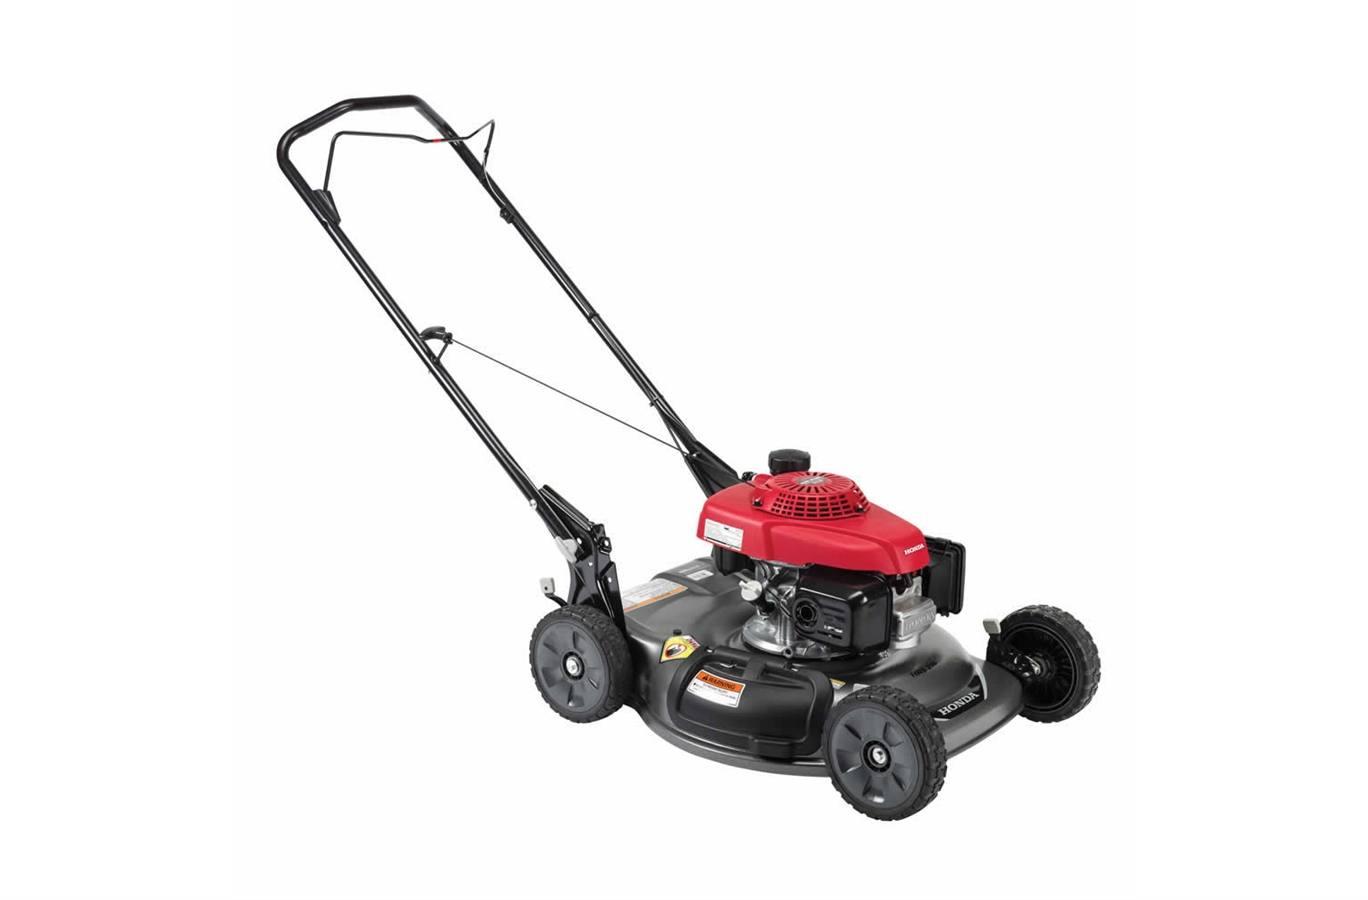 HRS216PKA. HRS216PKA lawn mower